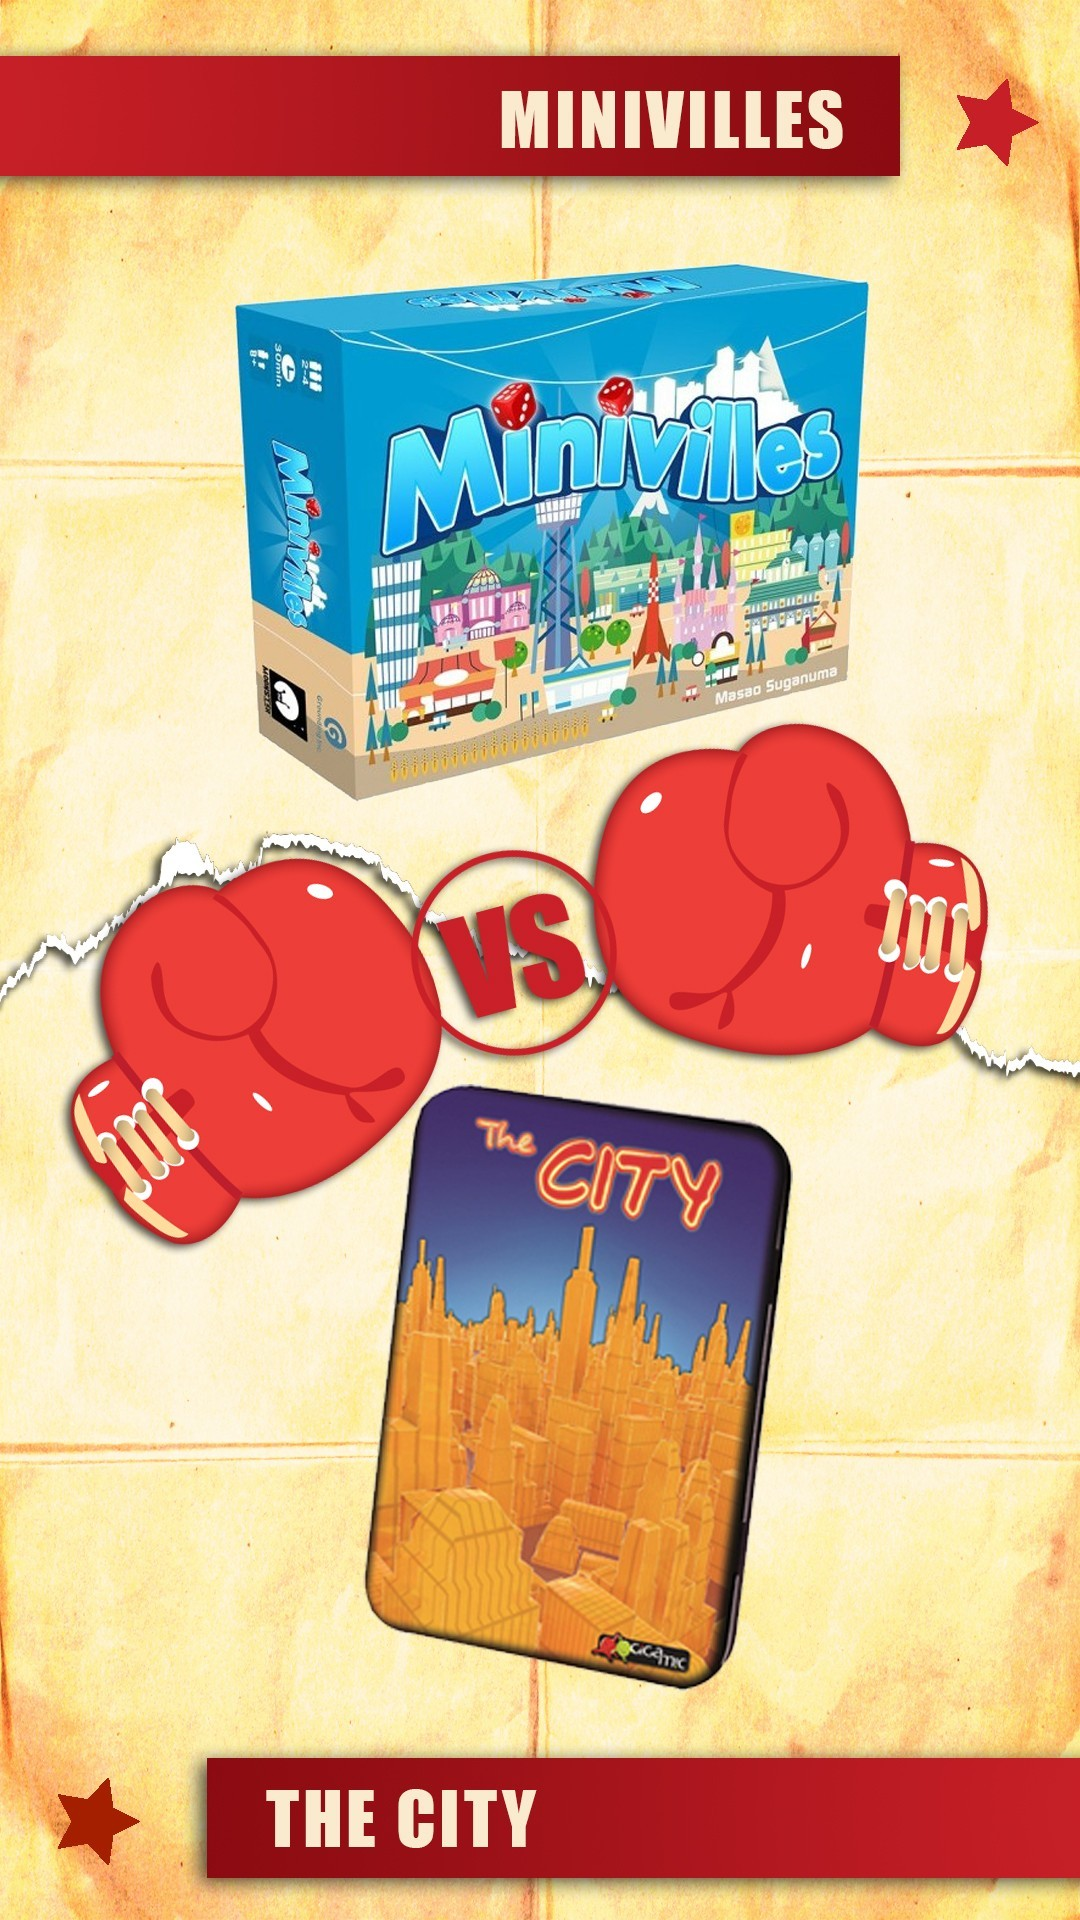 versus : minivilles vs the city